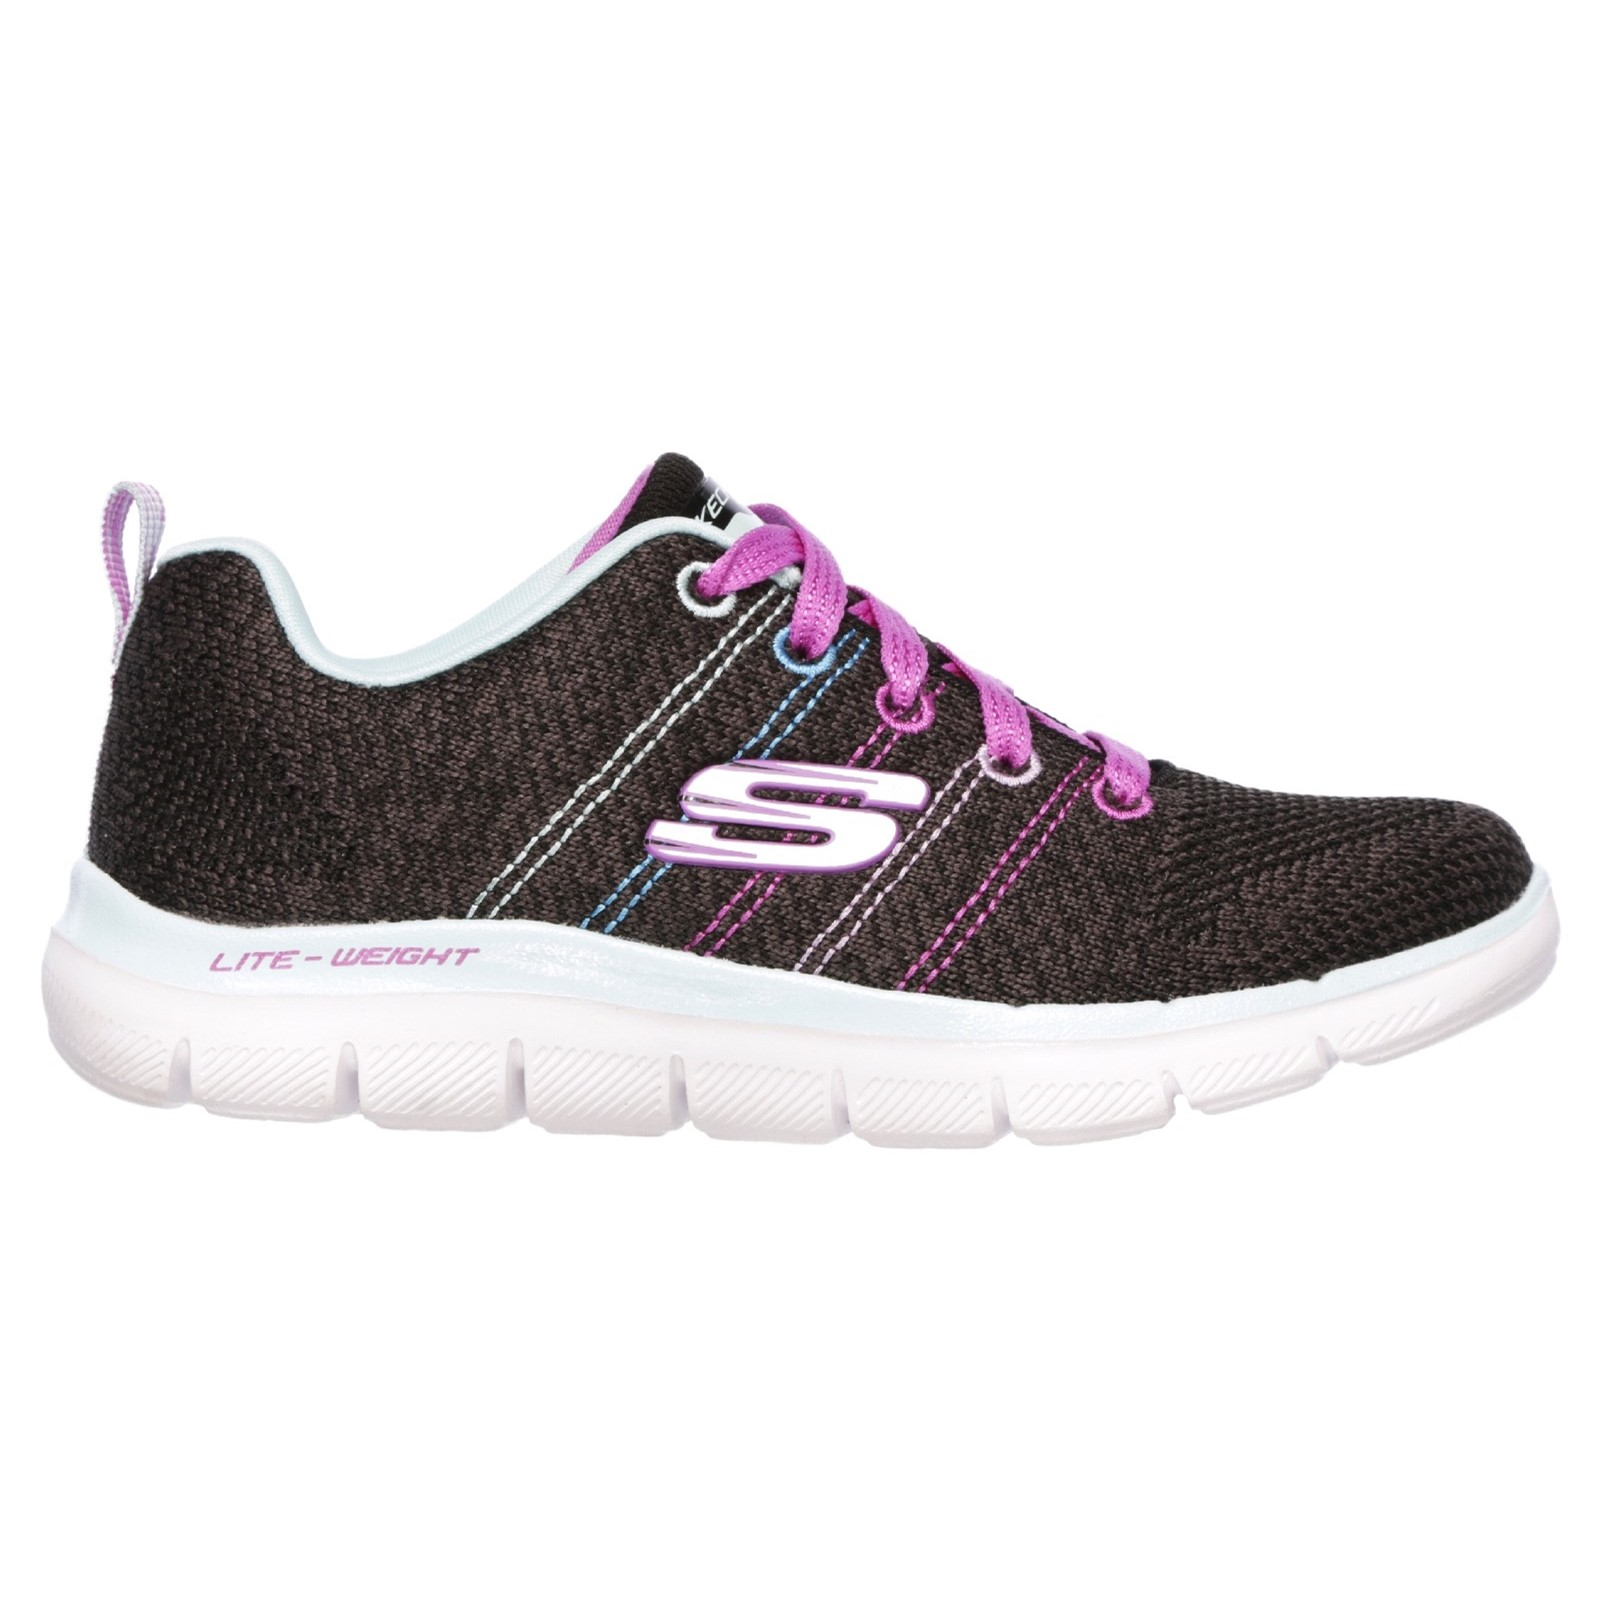 46670e4245c8 ... Nike Zoom Mercurial XI Flyknit FC Black Black-Hasta-Seaweed Black Black  ...